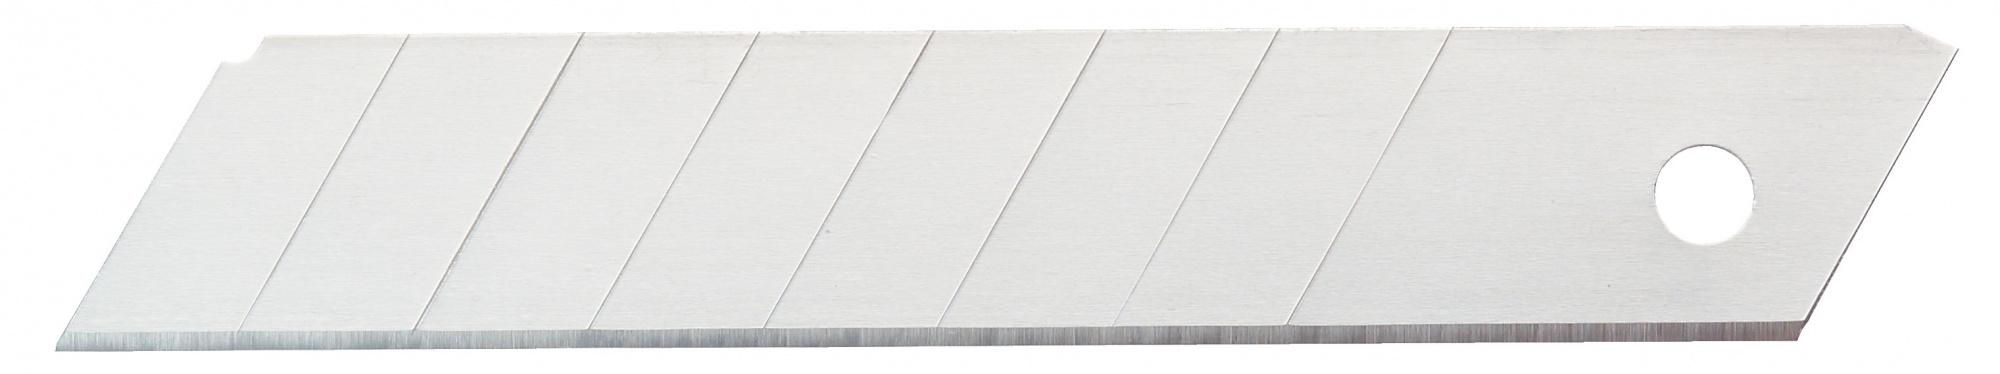 Irwin (10504561) - лезвие с отламывающимися сегментами 18 мм